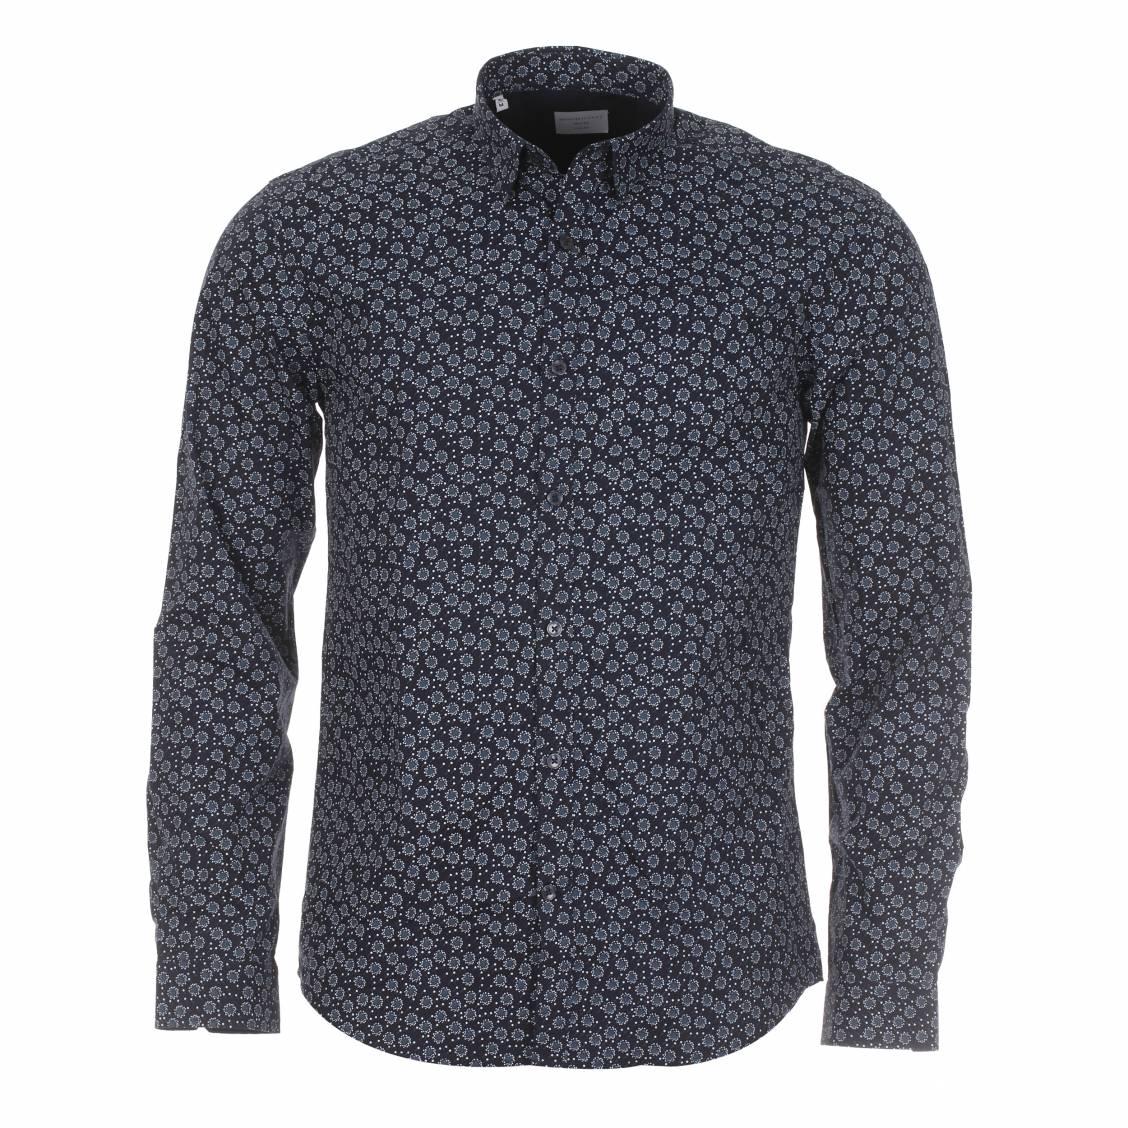 chemise homme selected petit col bleu marine motifs gris et blancs rue des hommes. Black Bedroom Furniture Sets. Home Design Ideas